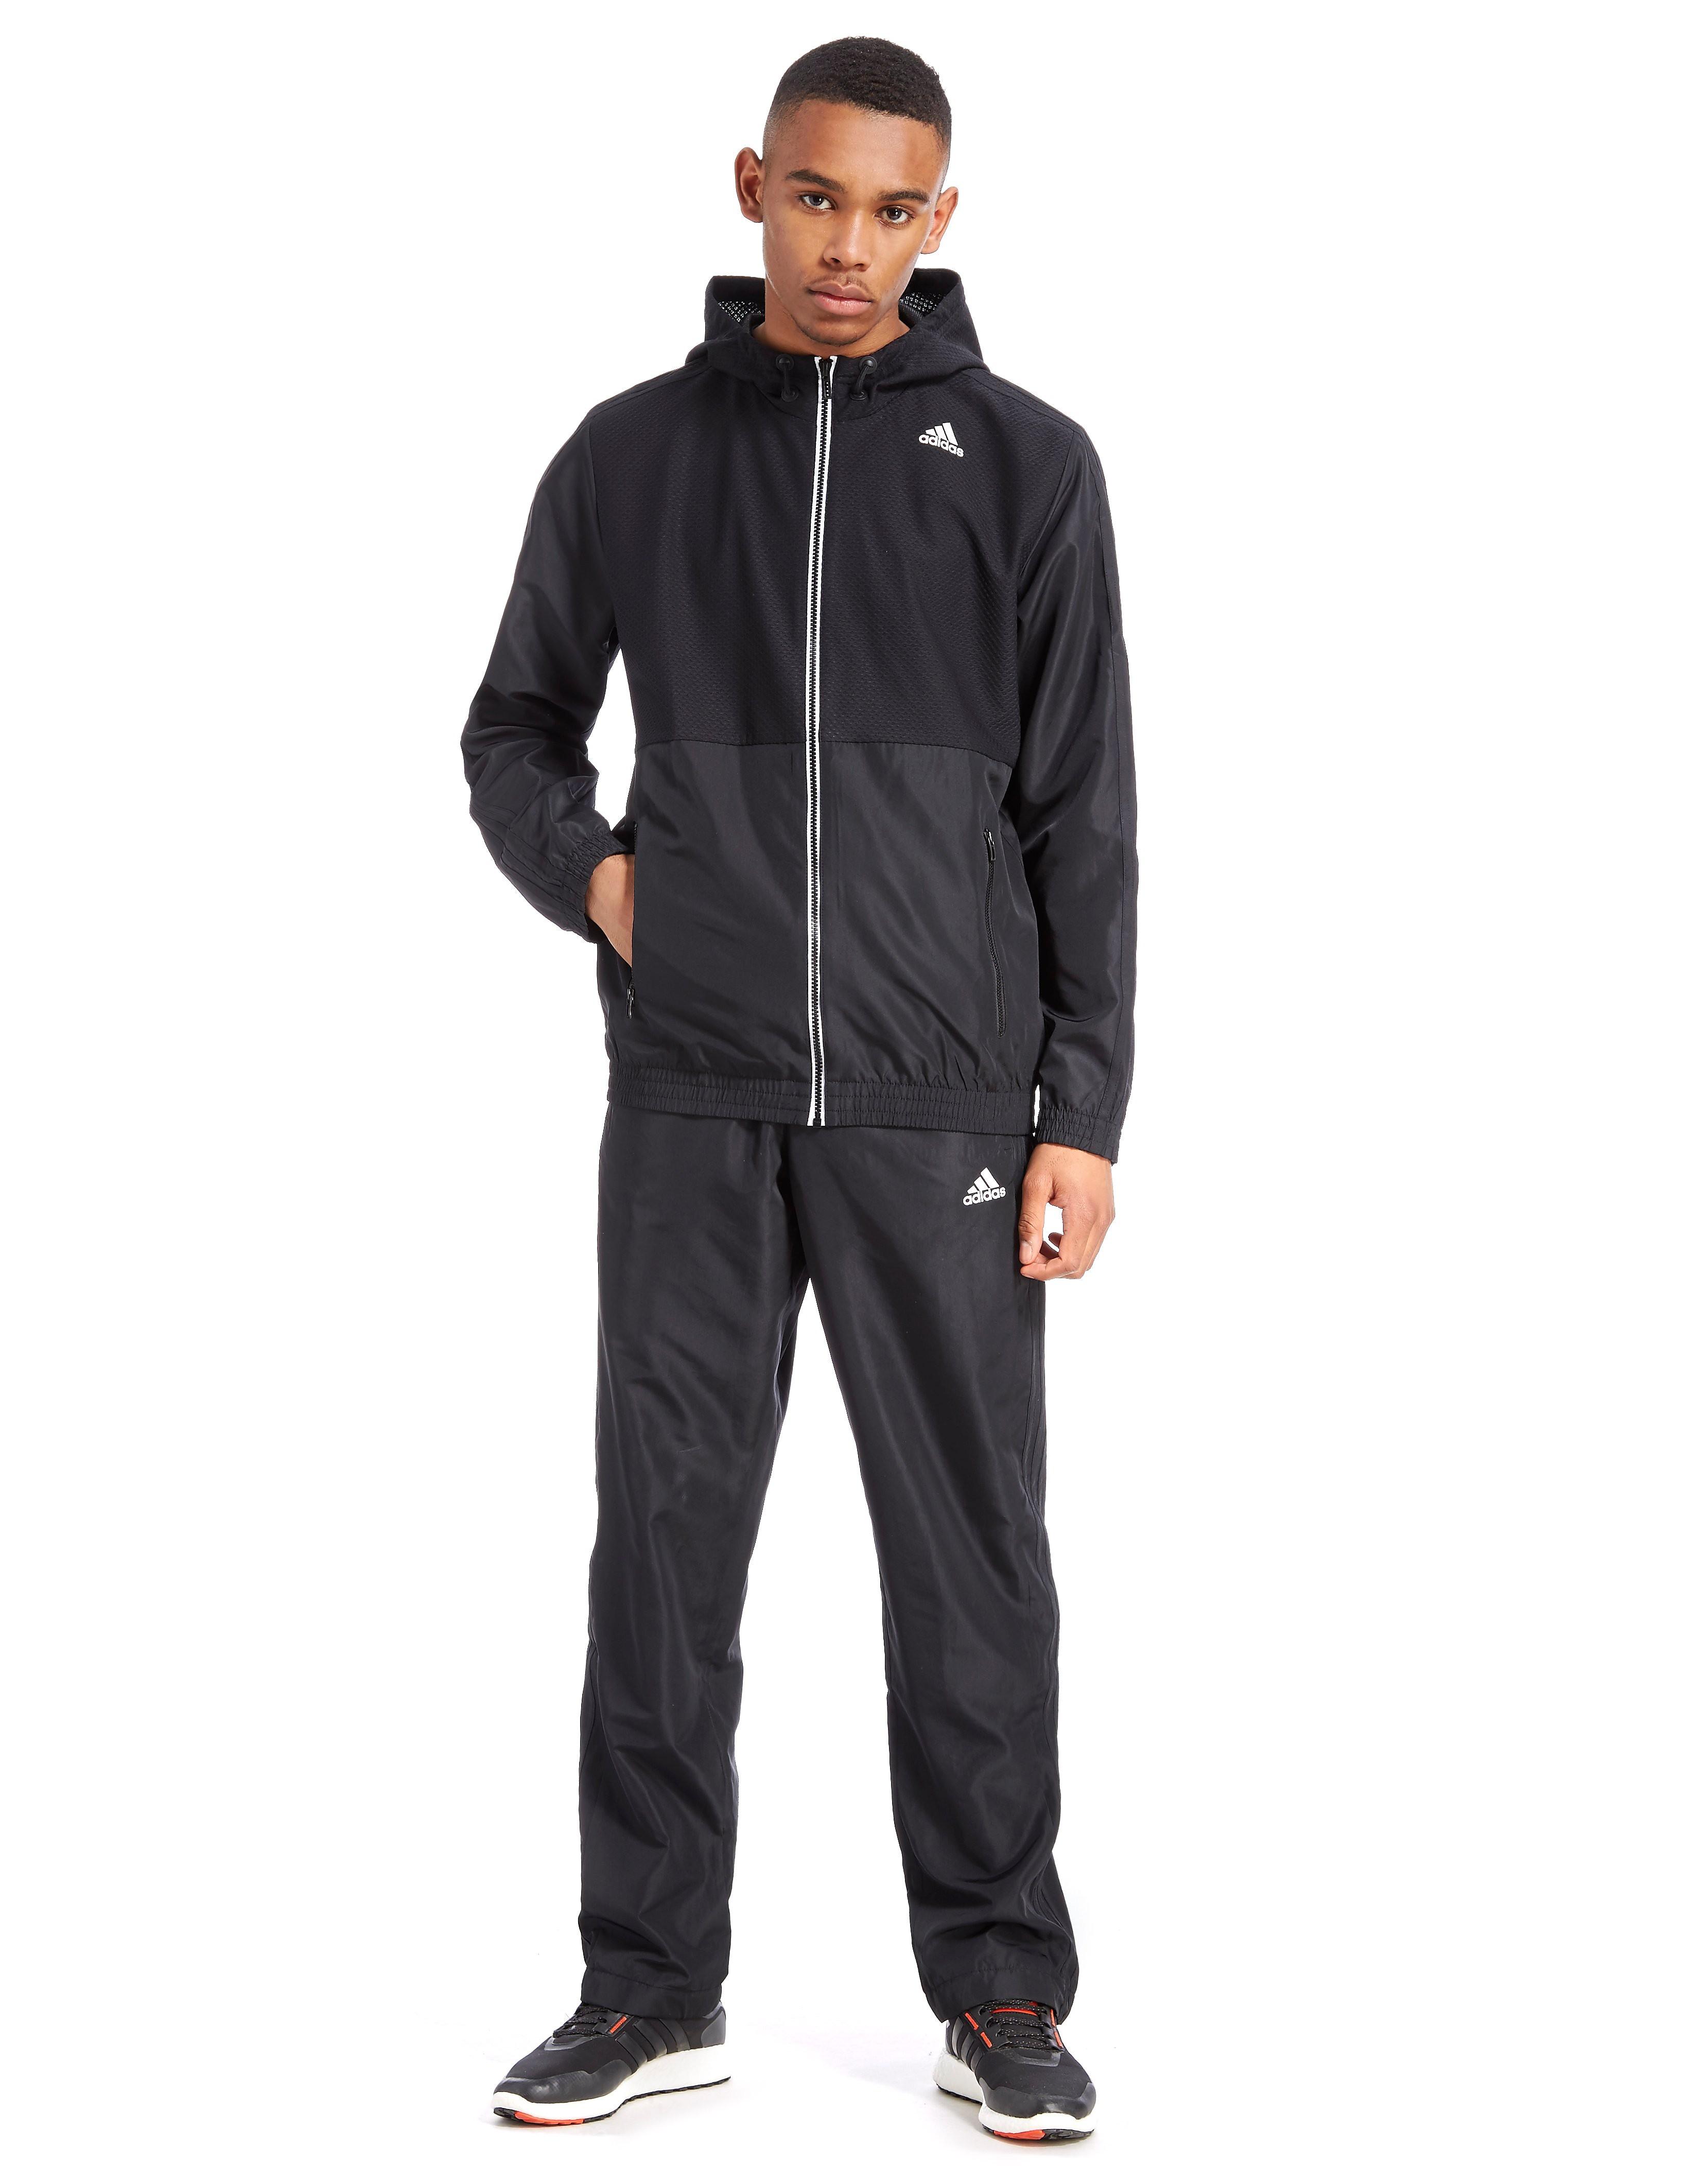 adidas Training Hooded Suit